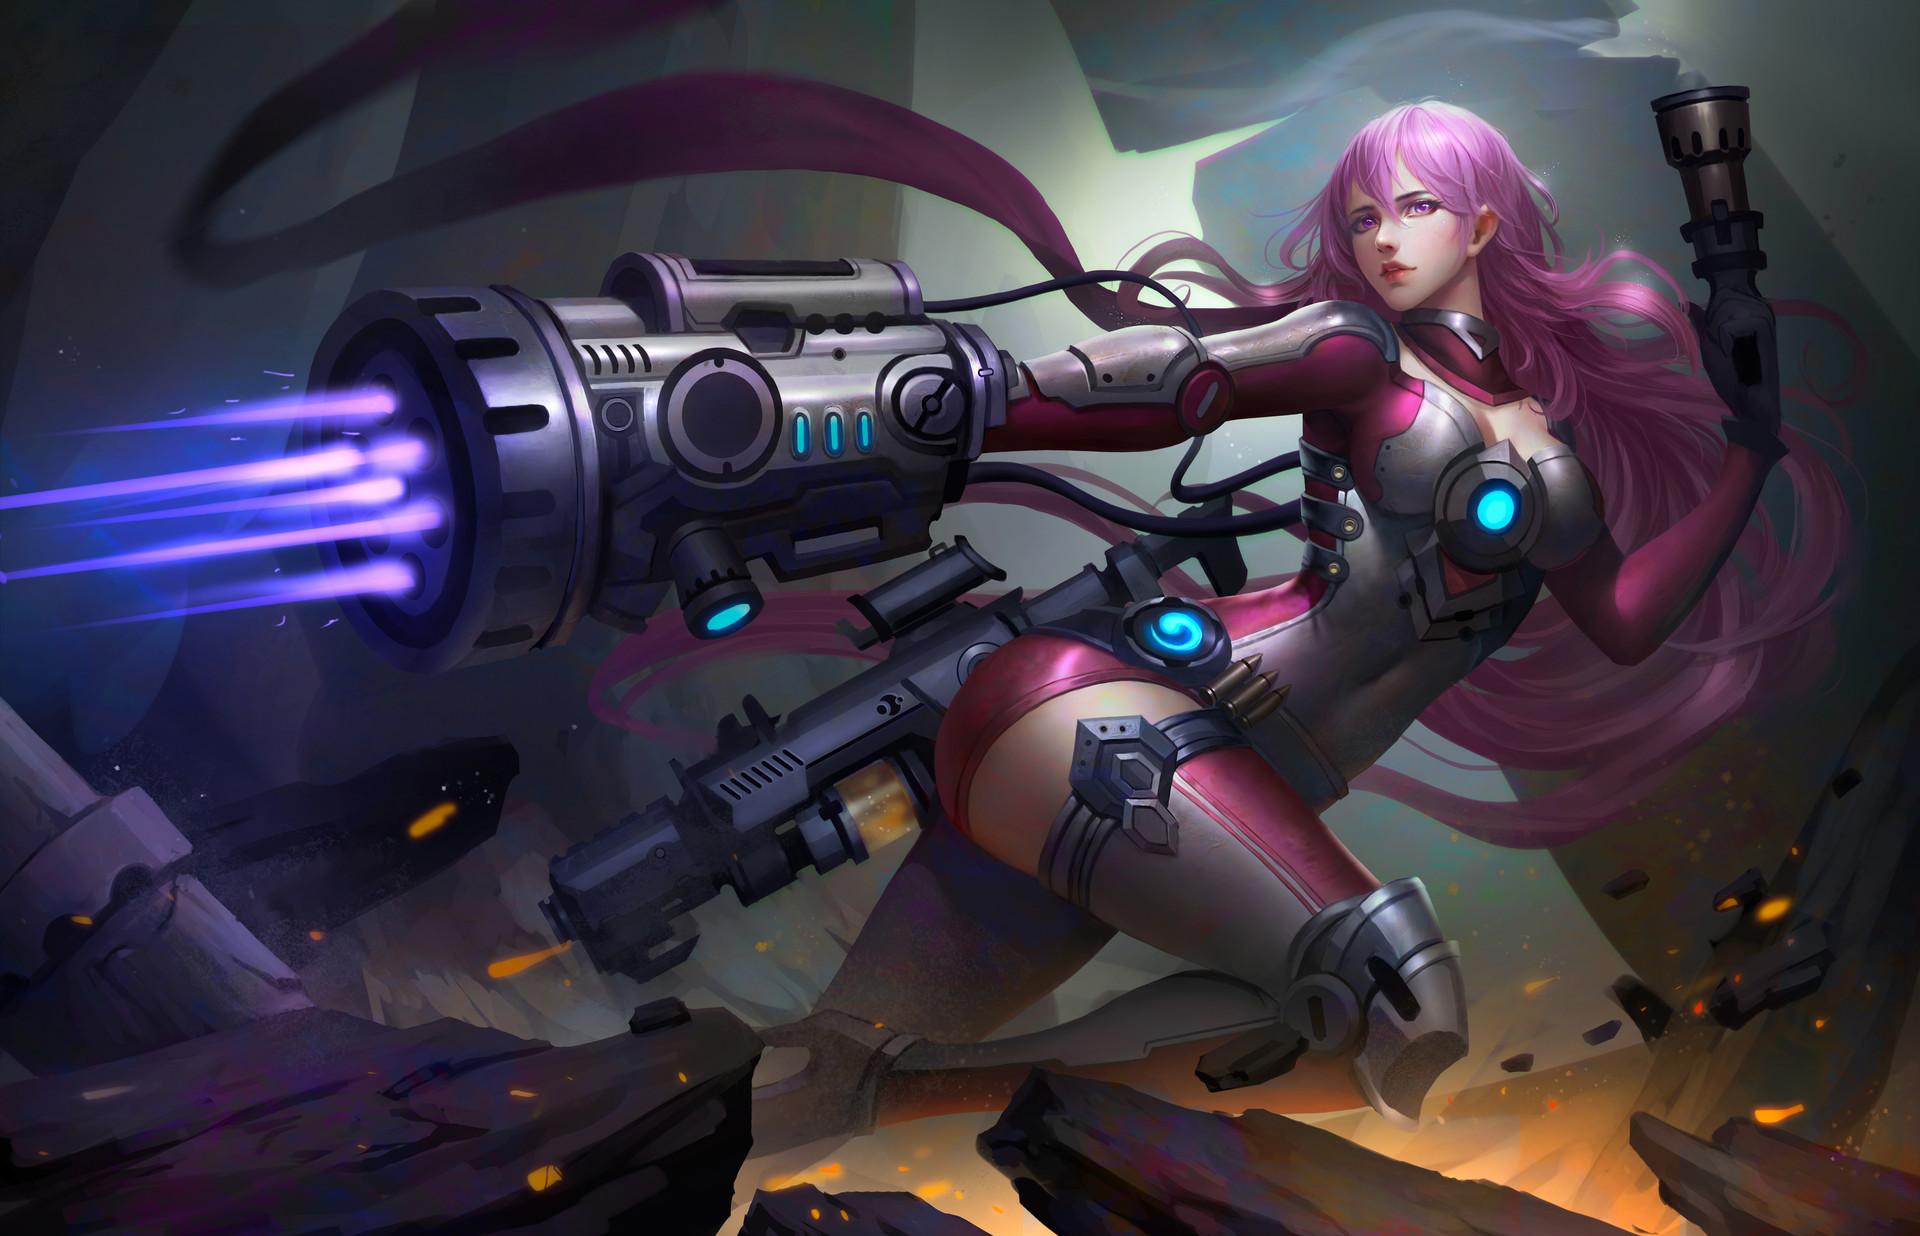 1400x900 Girl Wallpaper Warrior Fantasy Girl Futuristic Hd Fantasy Girls 4k